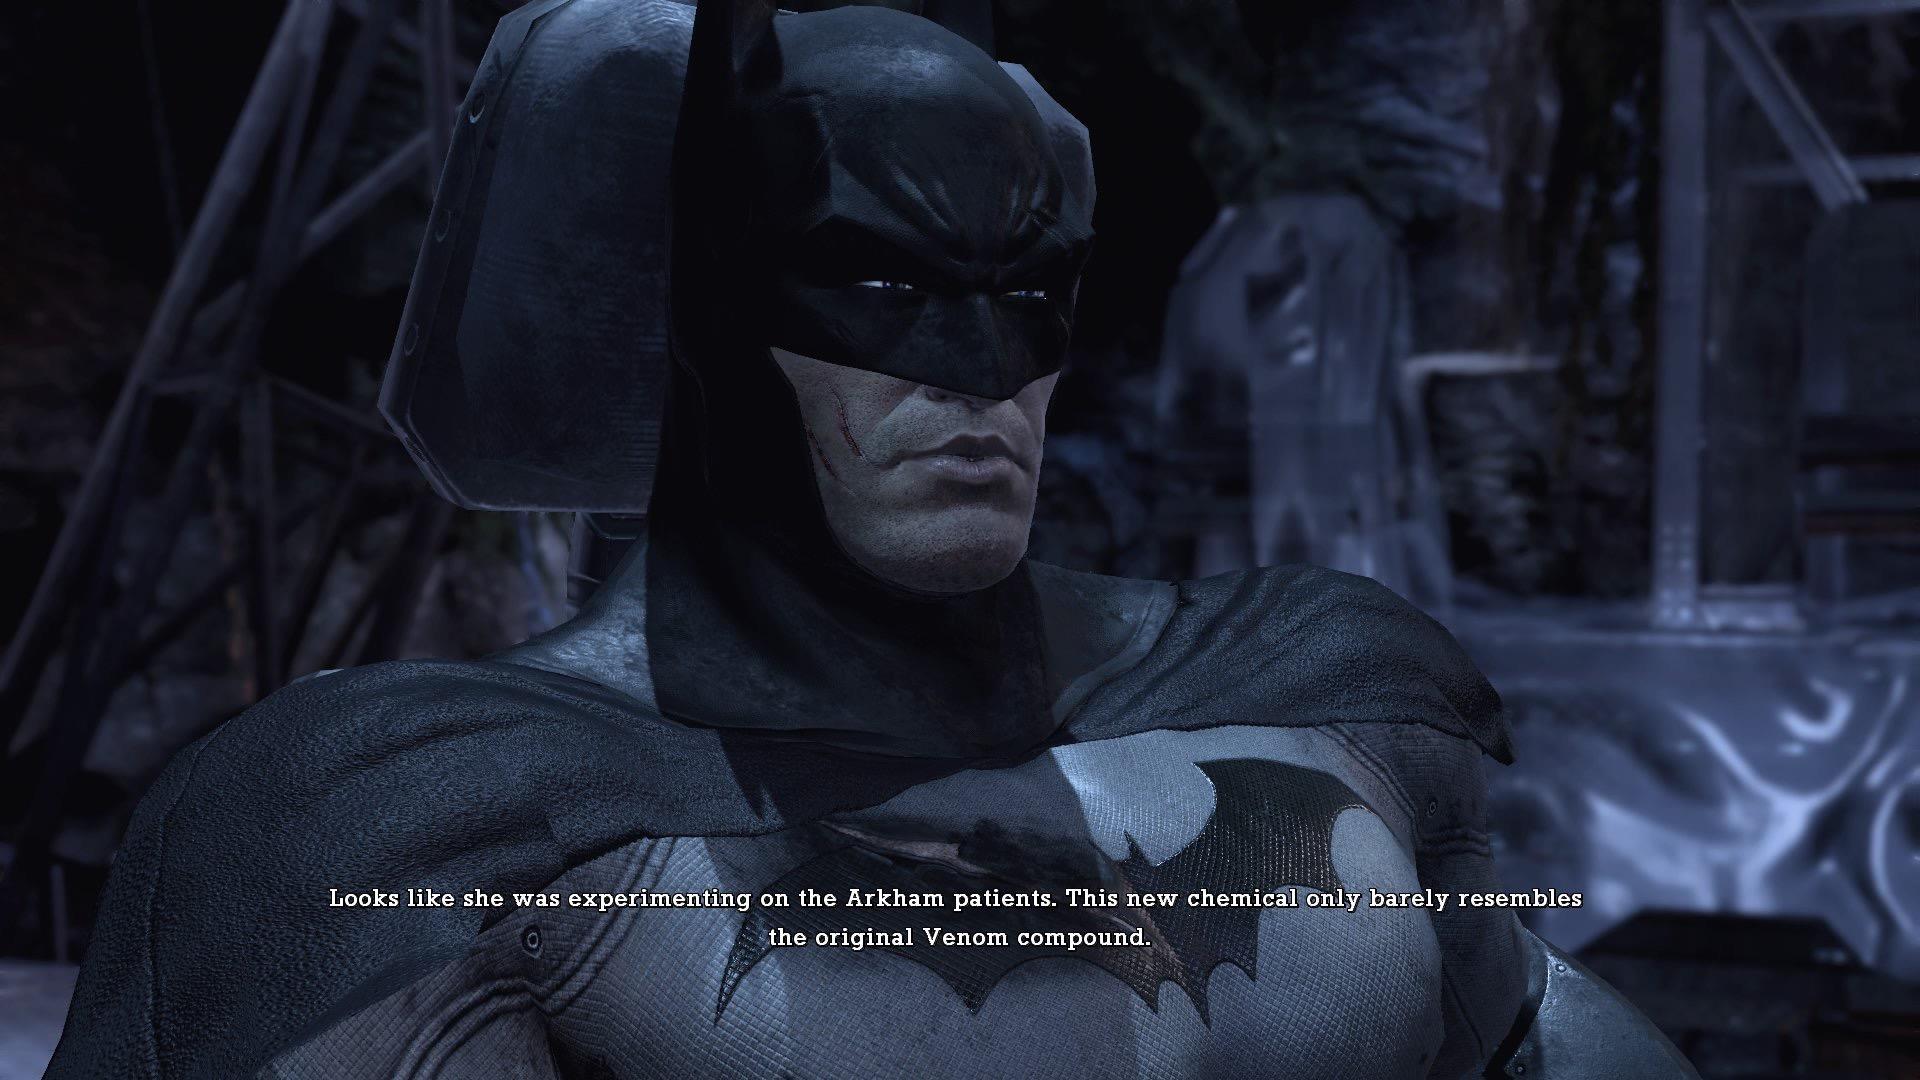 Batman In His Bat Computer By PhantomEvil On DeviantArt